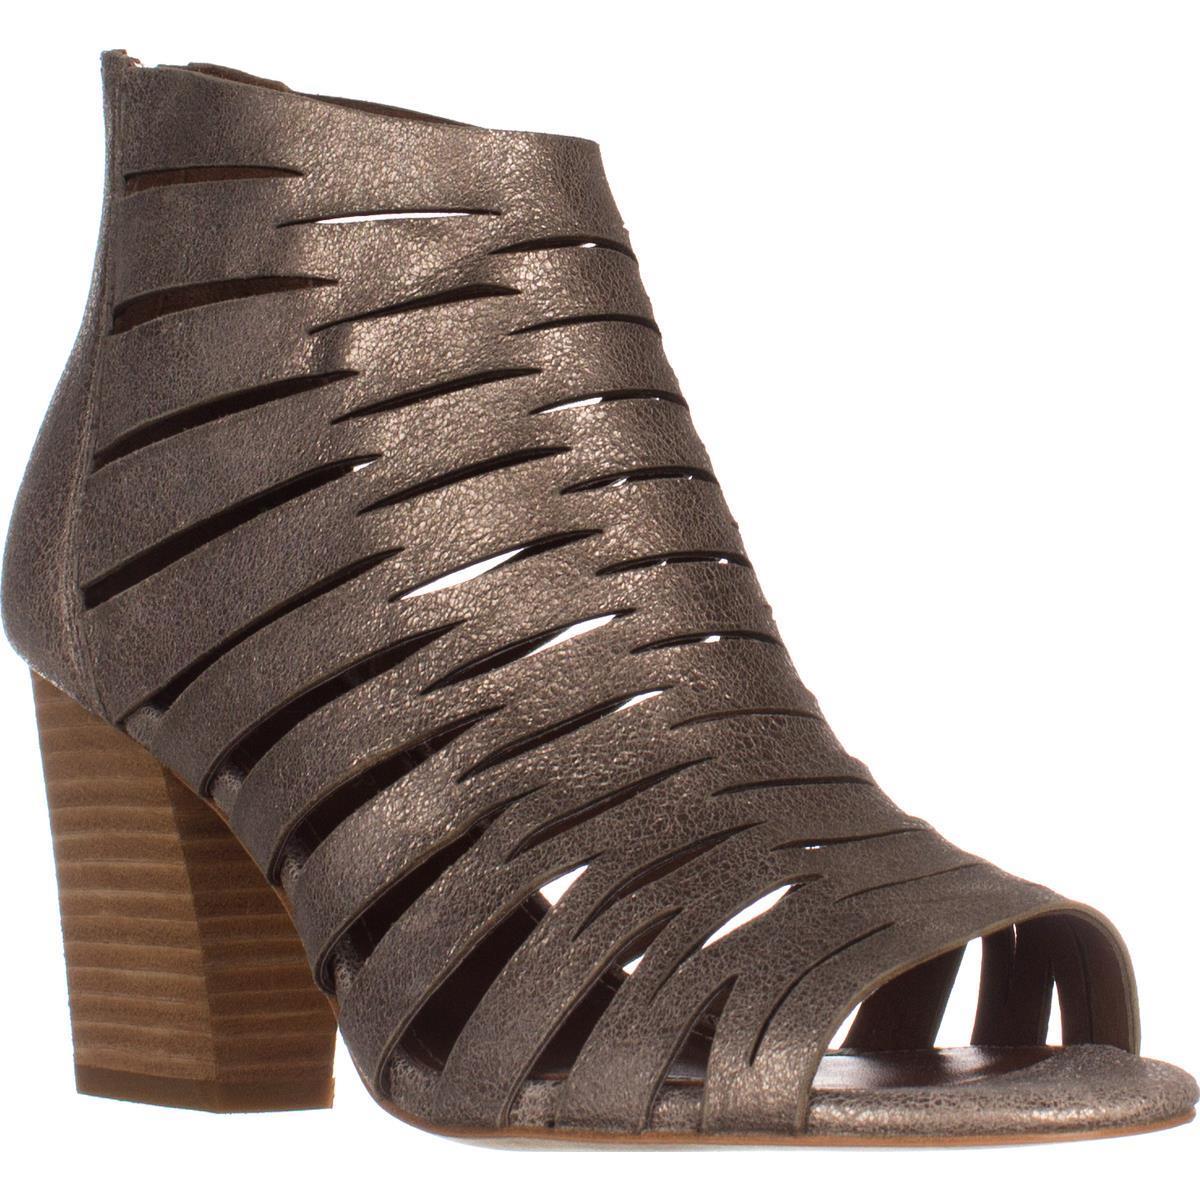 Womens Donald J Pliner Greece Open Toe Zip Sandals, Blush by Donald J Pliner